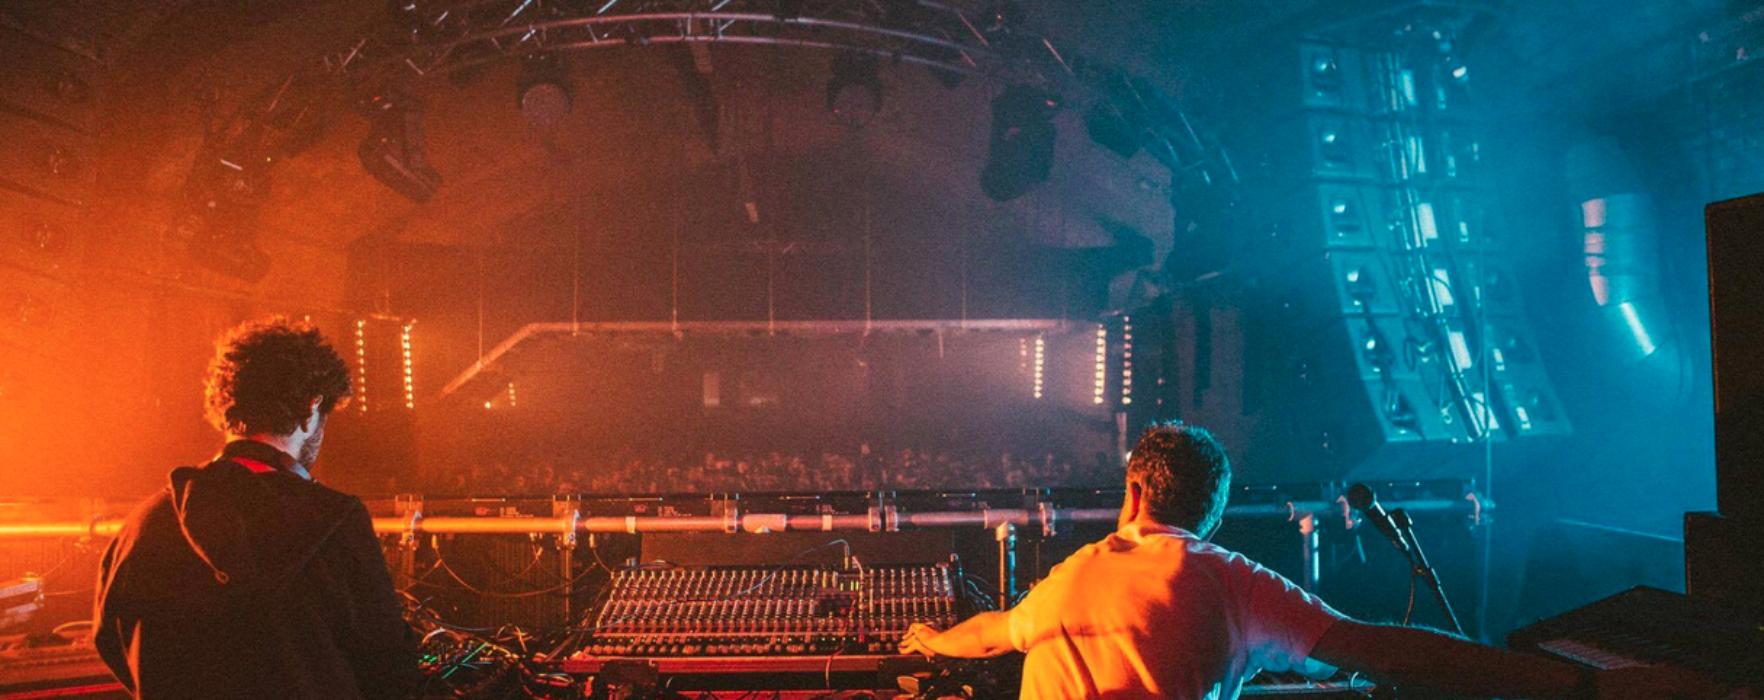 Dekmantel bring Amsterdam techno to Manchester's WHP